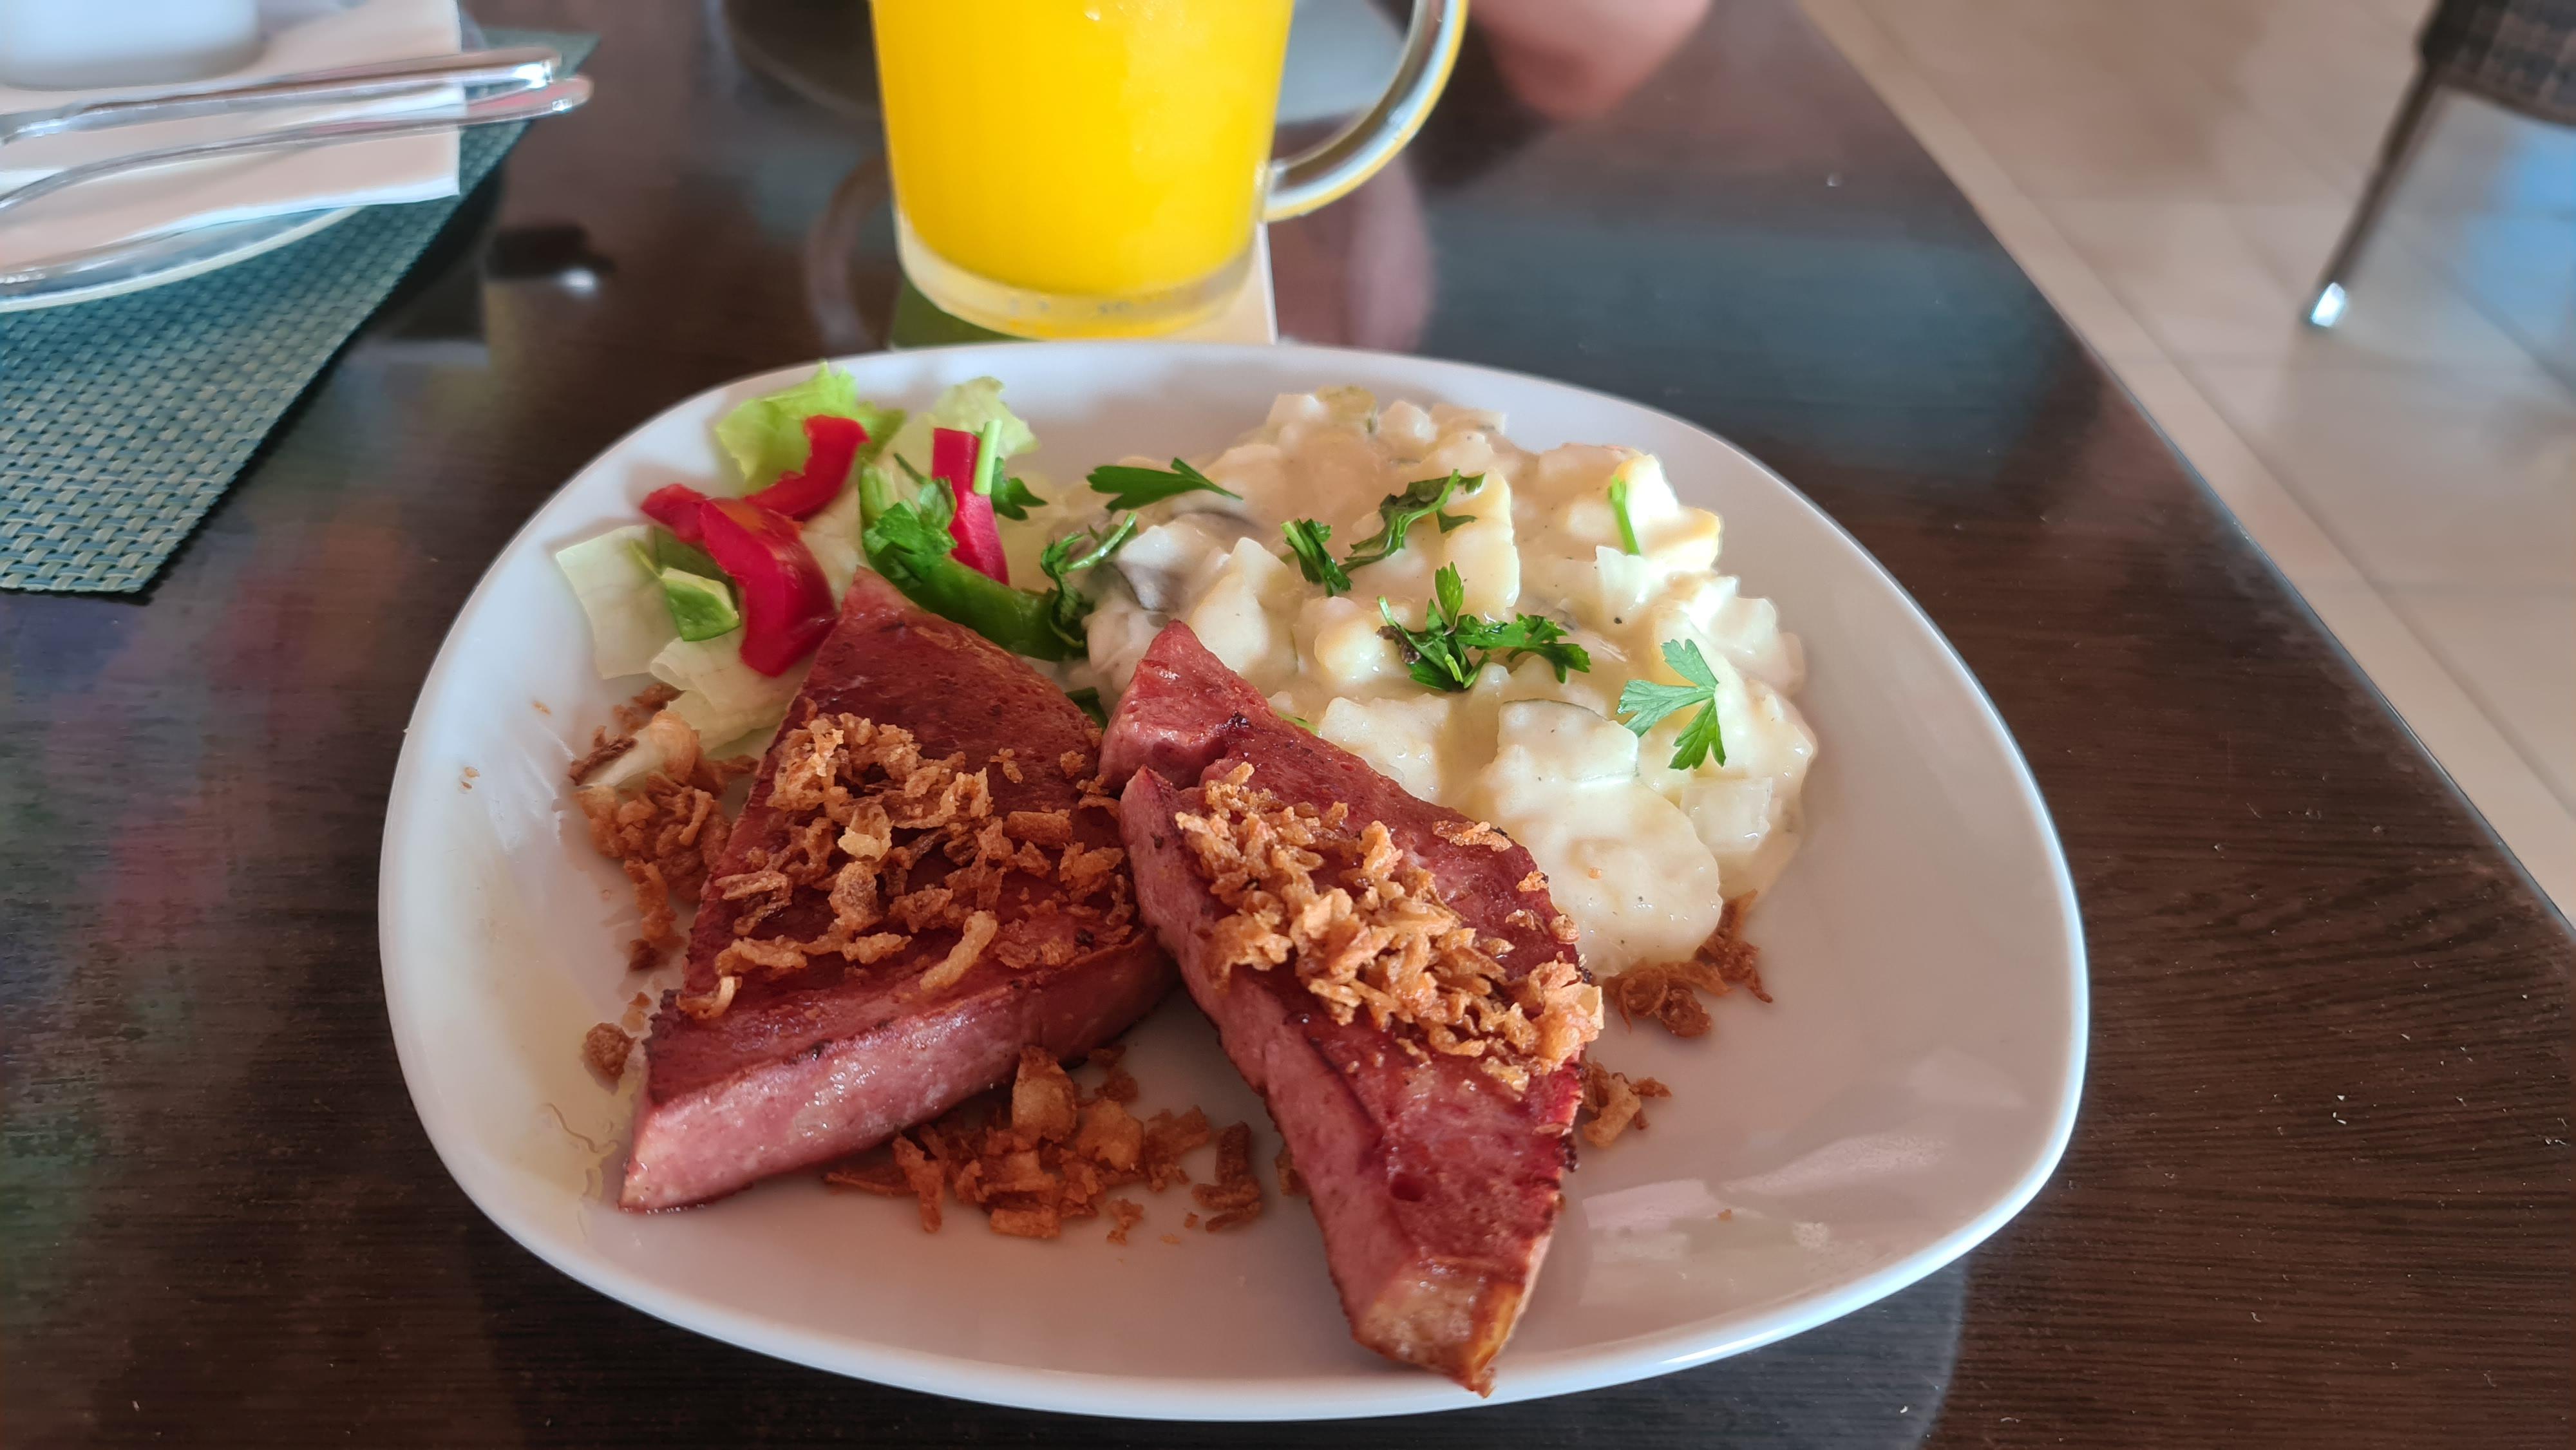 https://foodloader.net/Holz_2020-08-29_Fleischkaese_mit_Kartoffelsalat.jpg